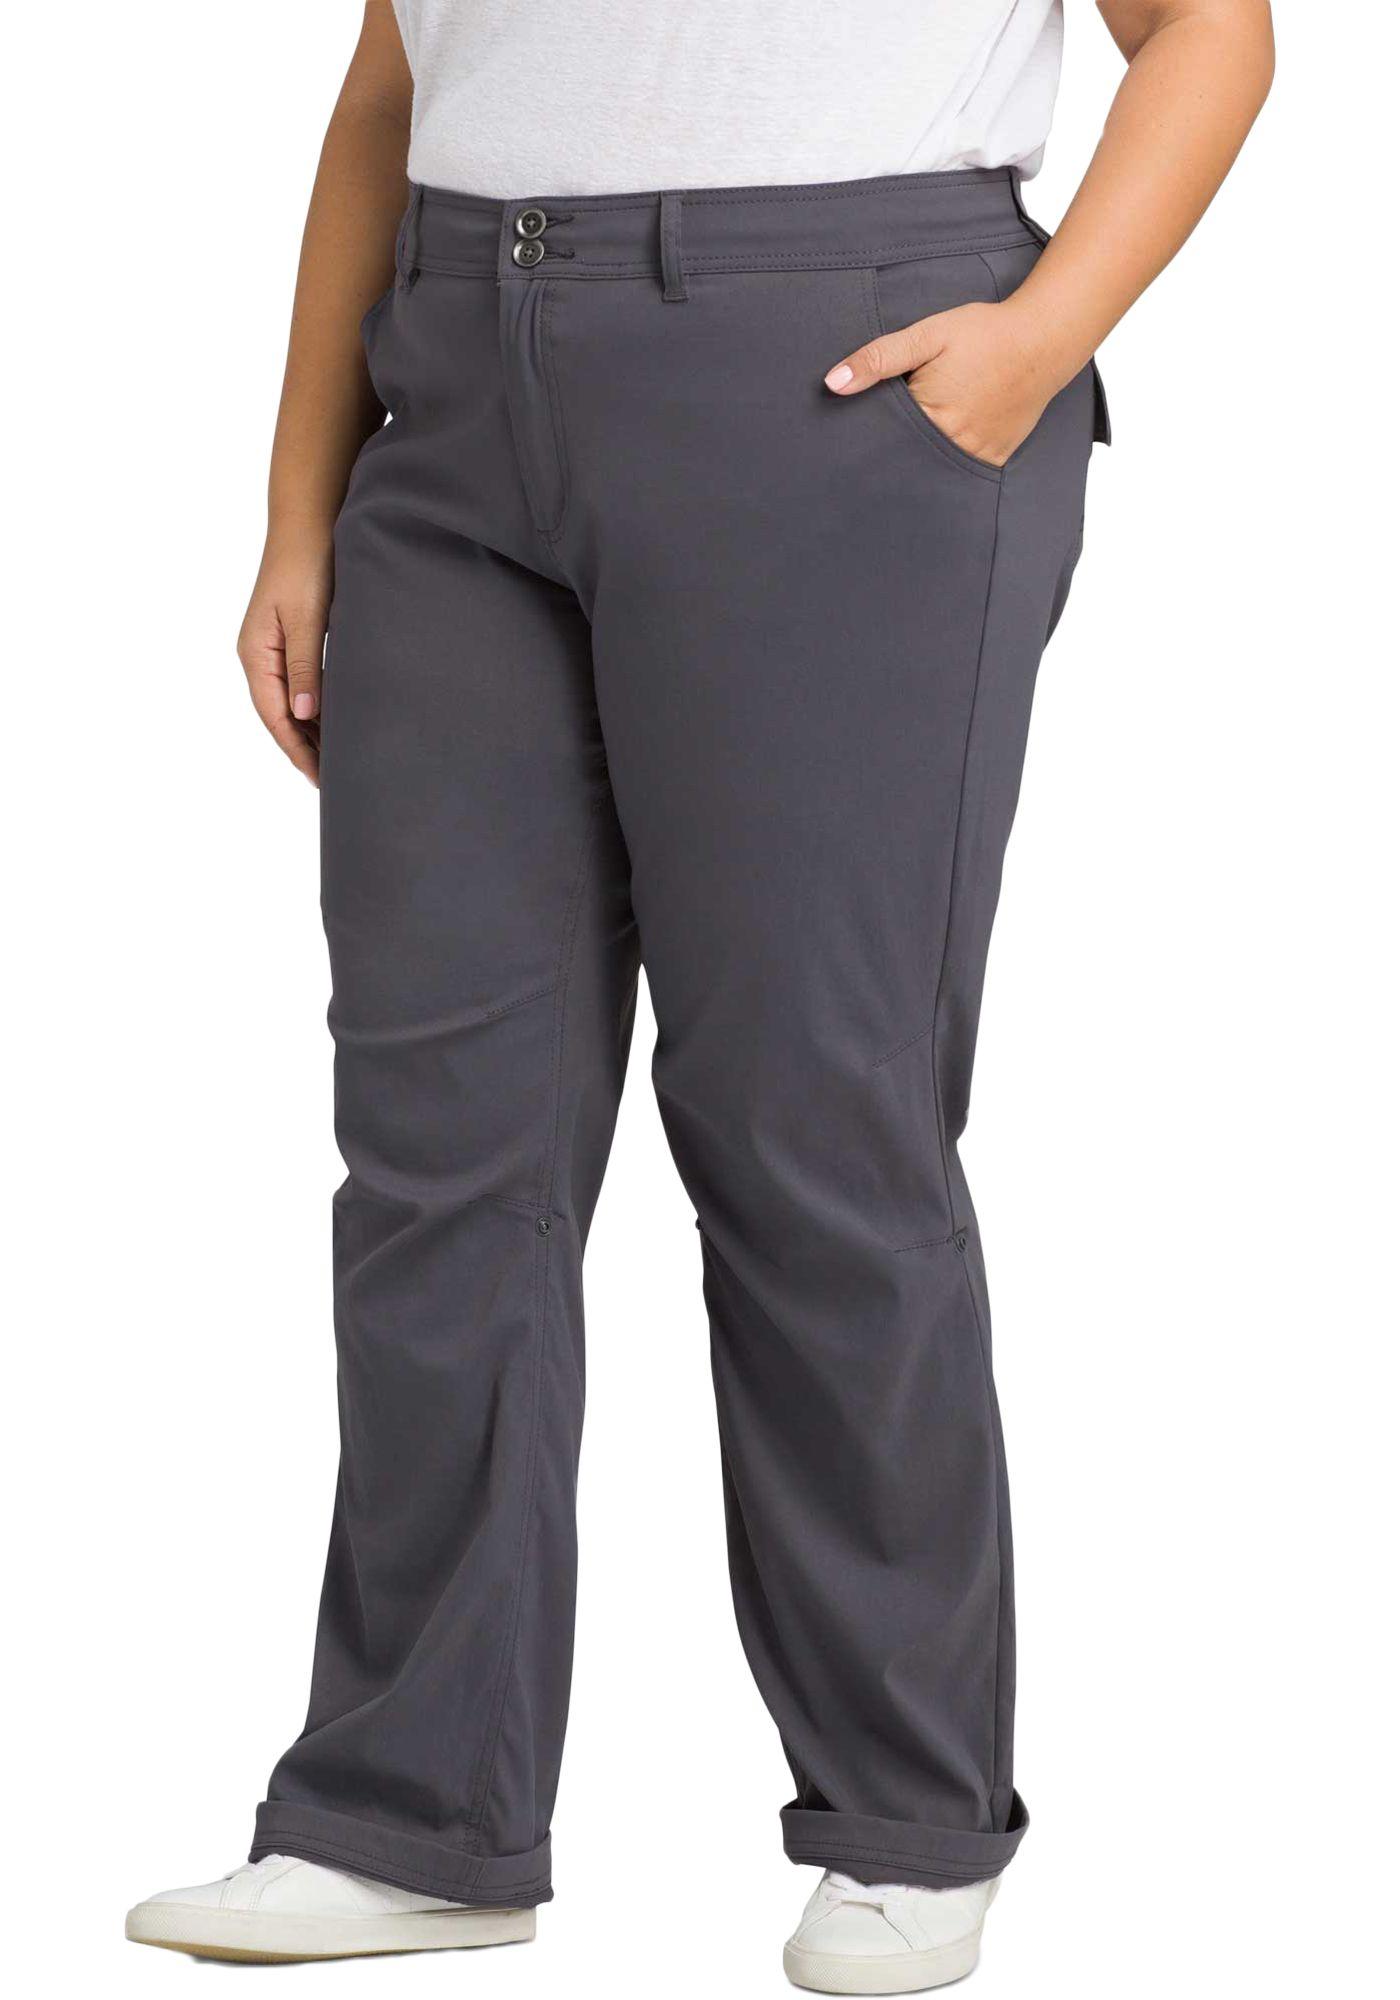 prAna Women's Plus Size Halle Pants